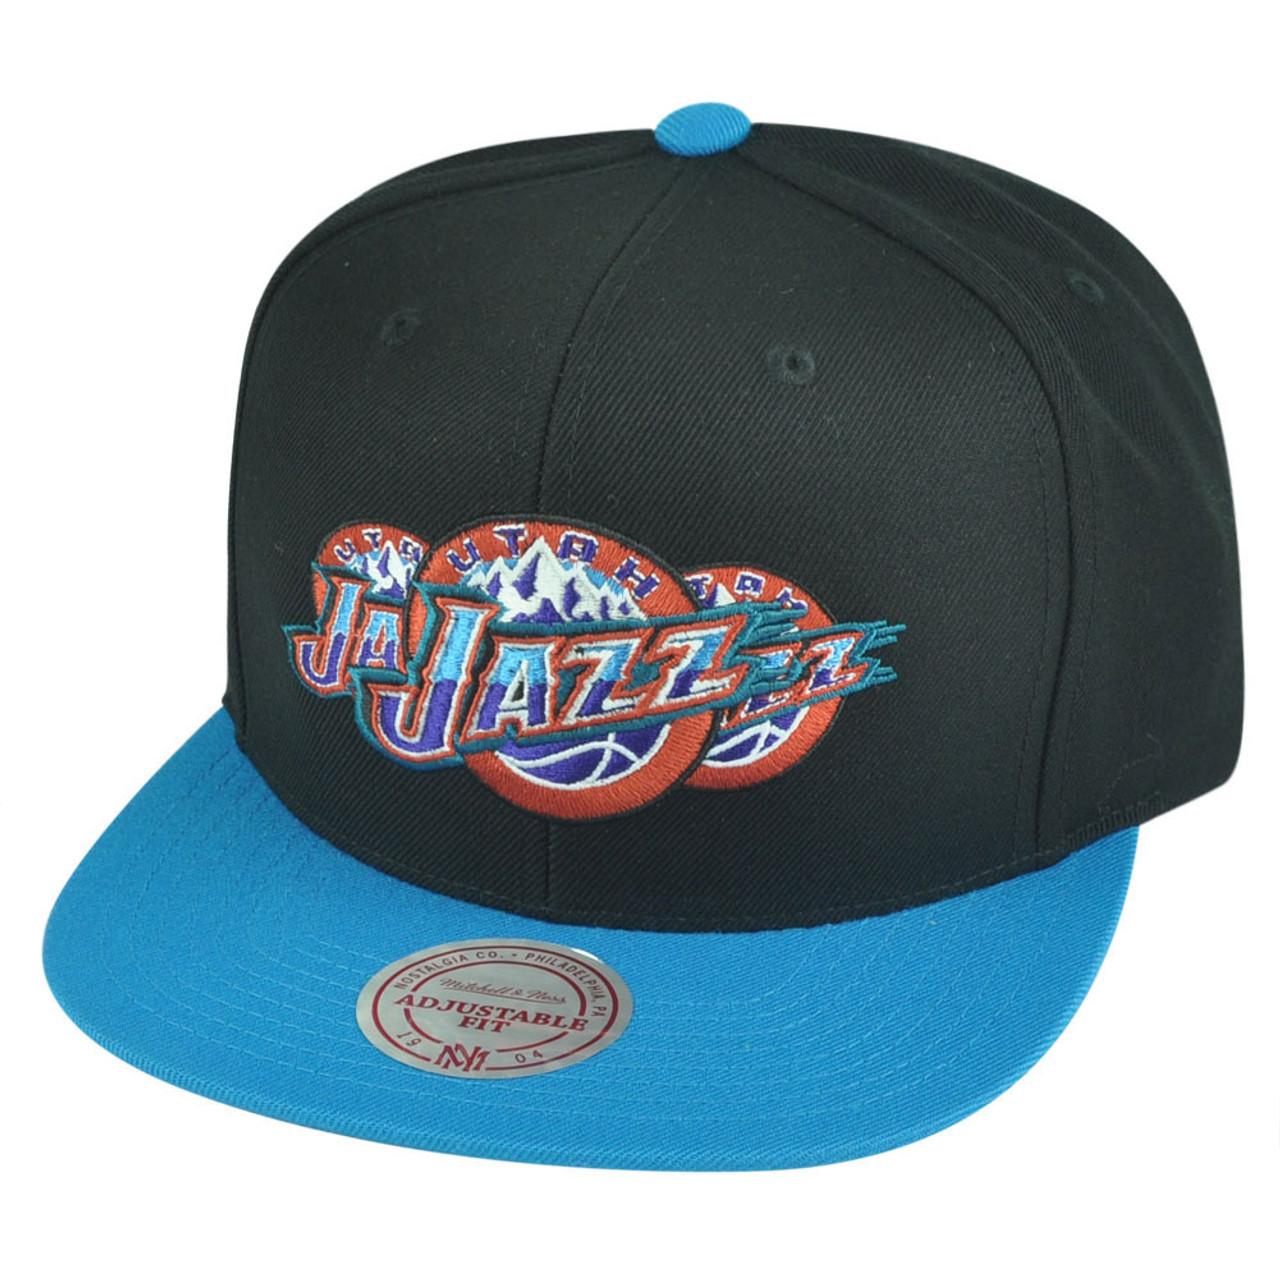 9f6cc0cddc6134 NBA Mitchell Ness Utah Jazz NP57 Triple Stack Logo Flat Bill Snapback Hat  Cap - Cap Store Online.com